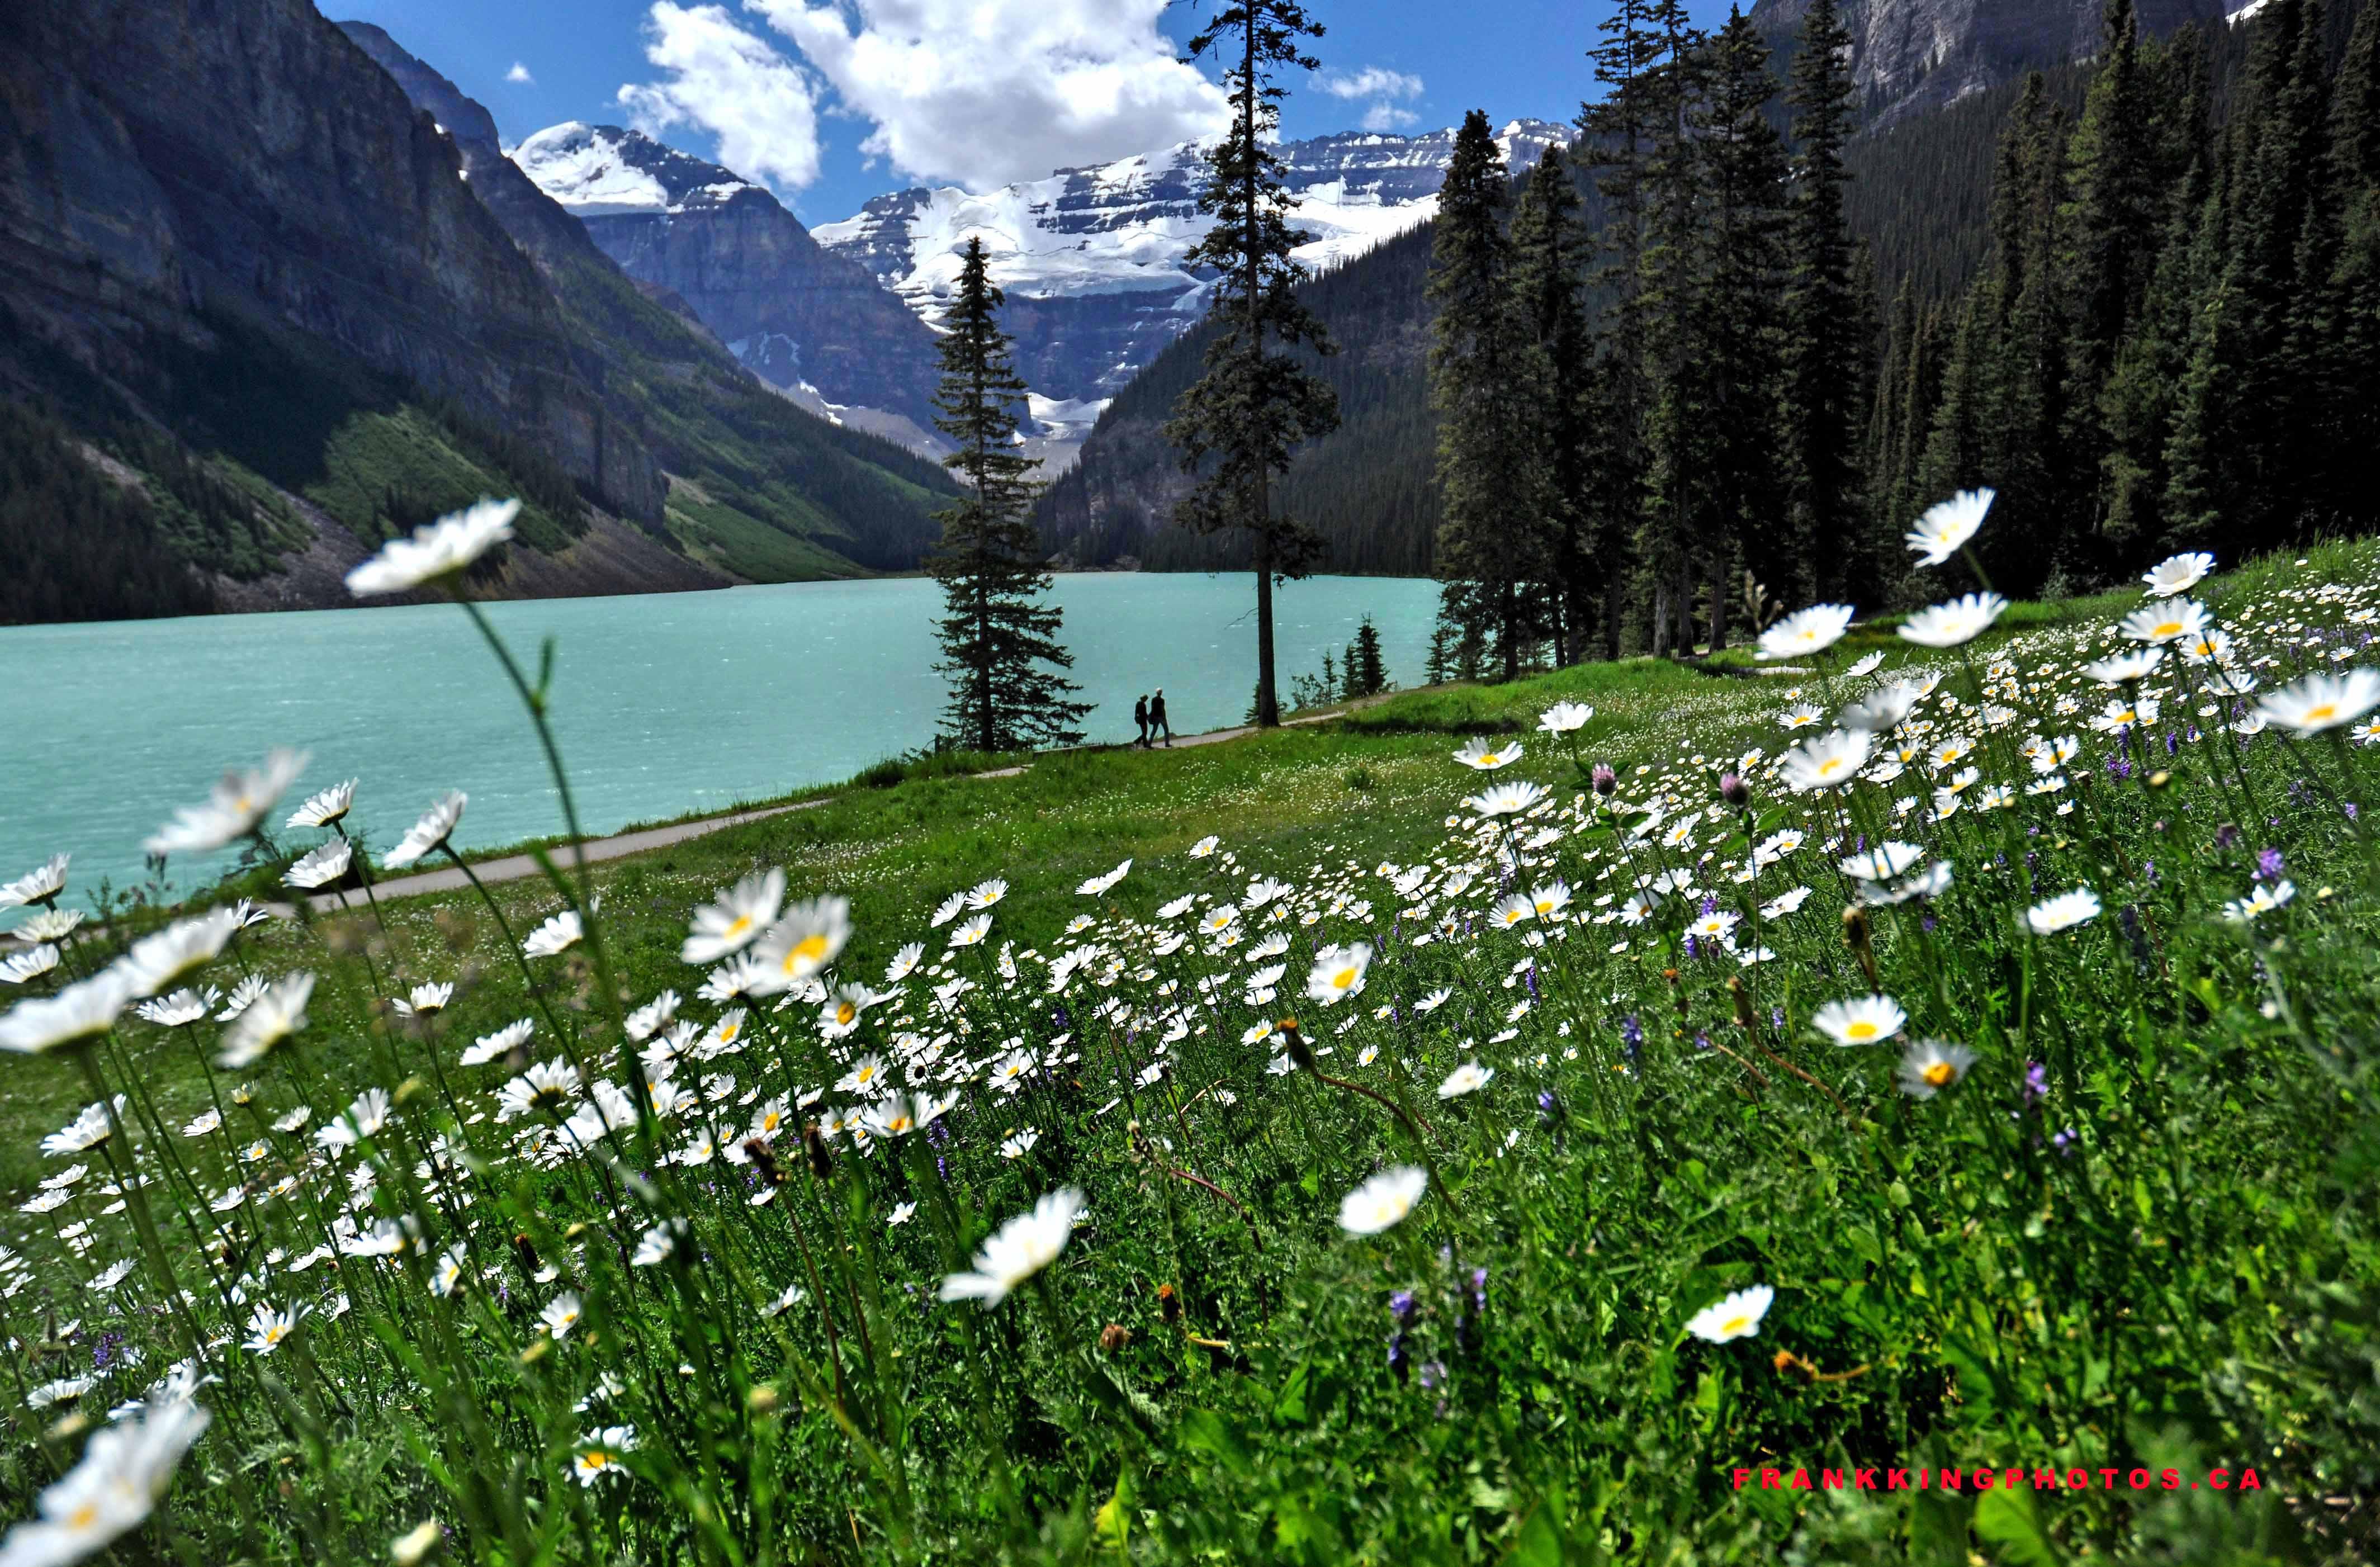 sweet photography bloomington indiana 2U75F